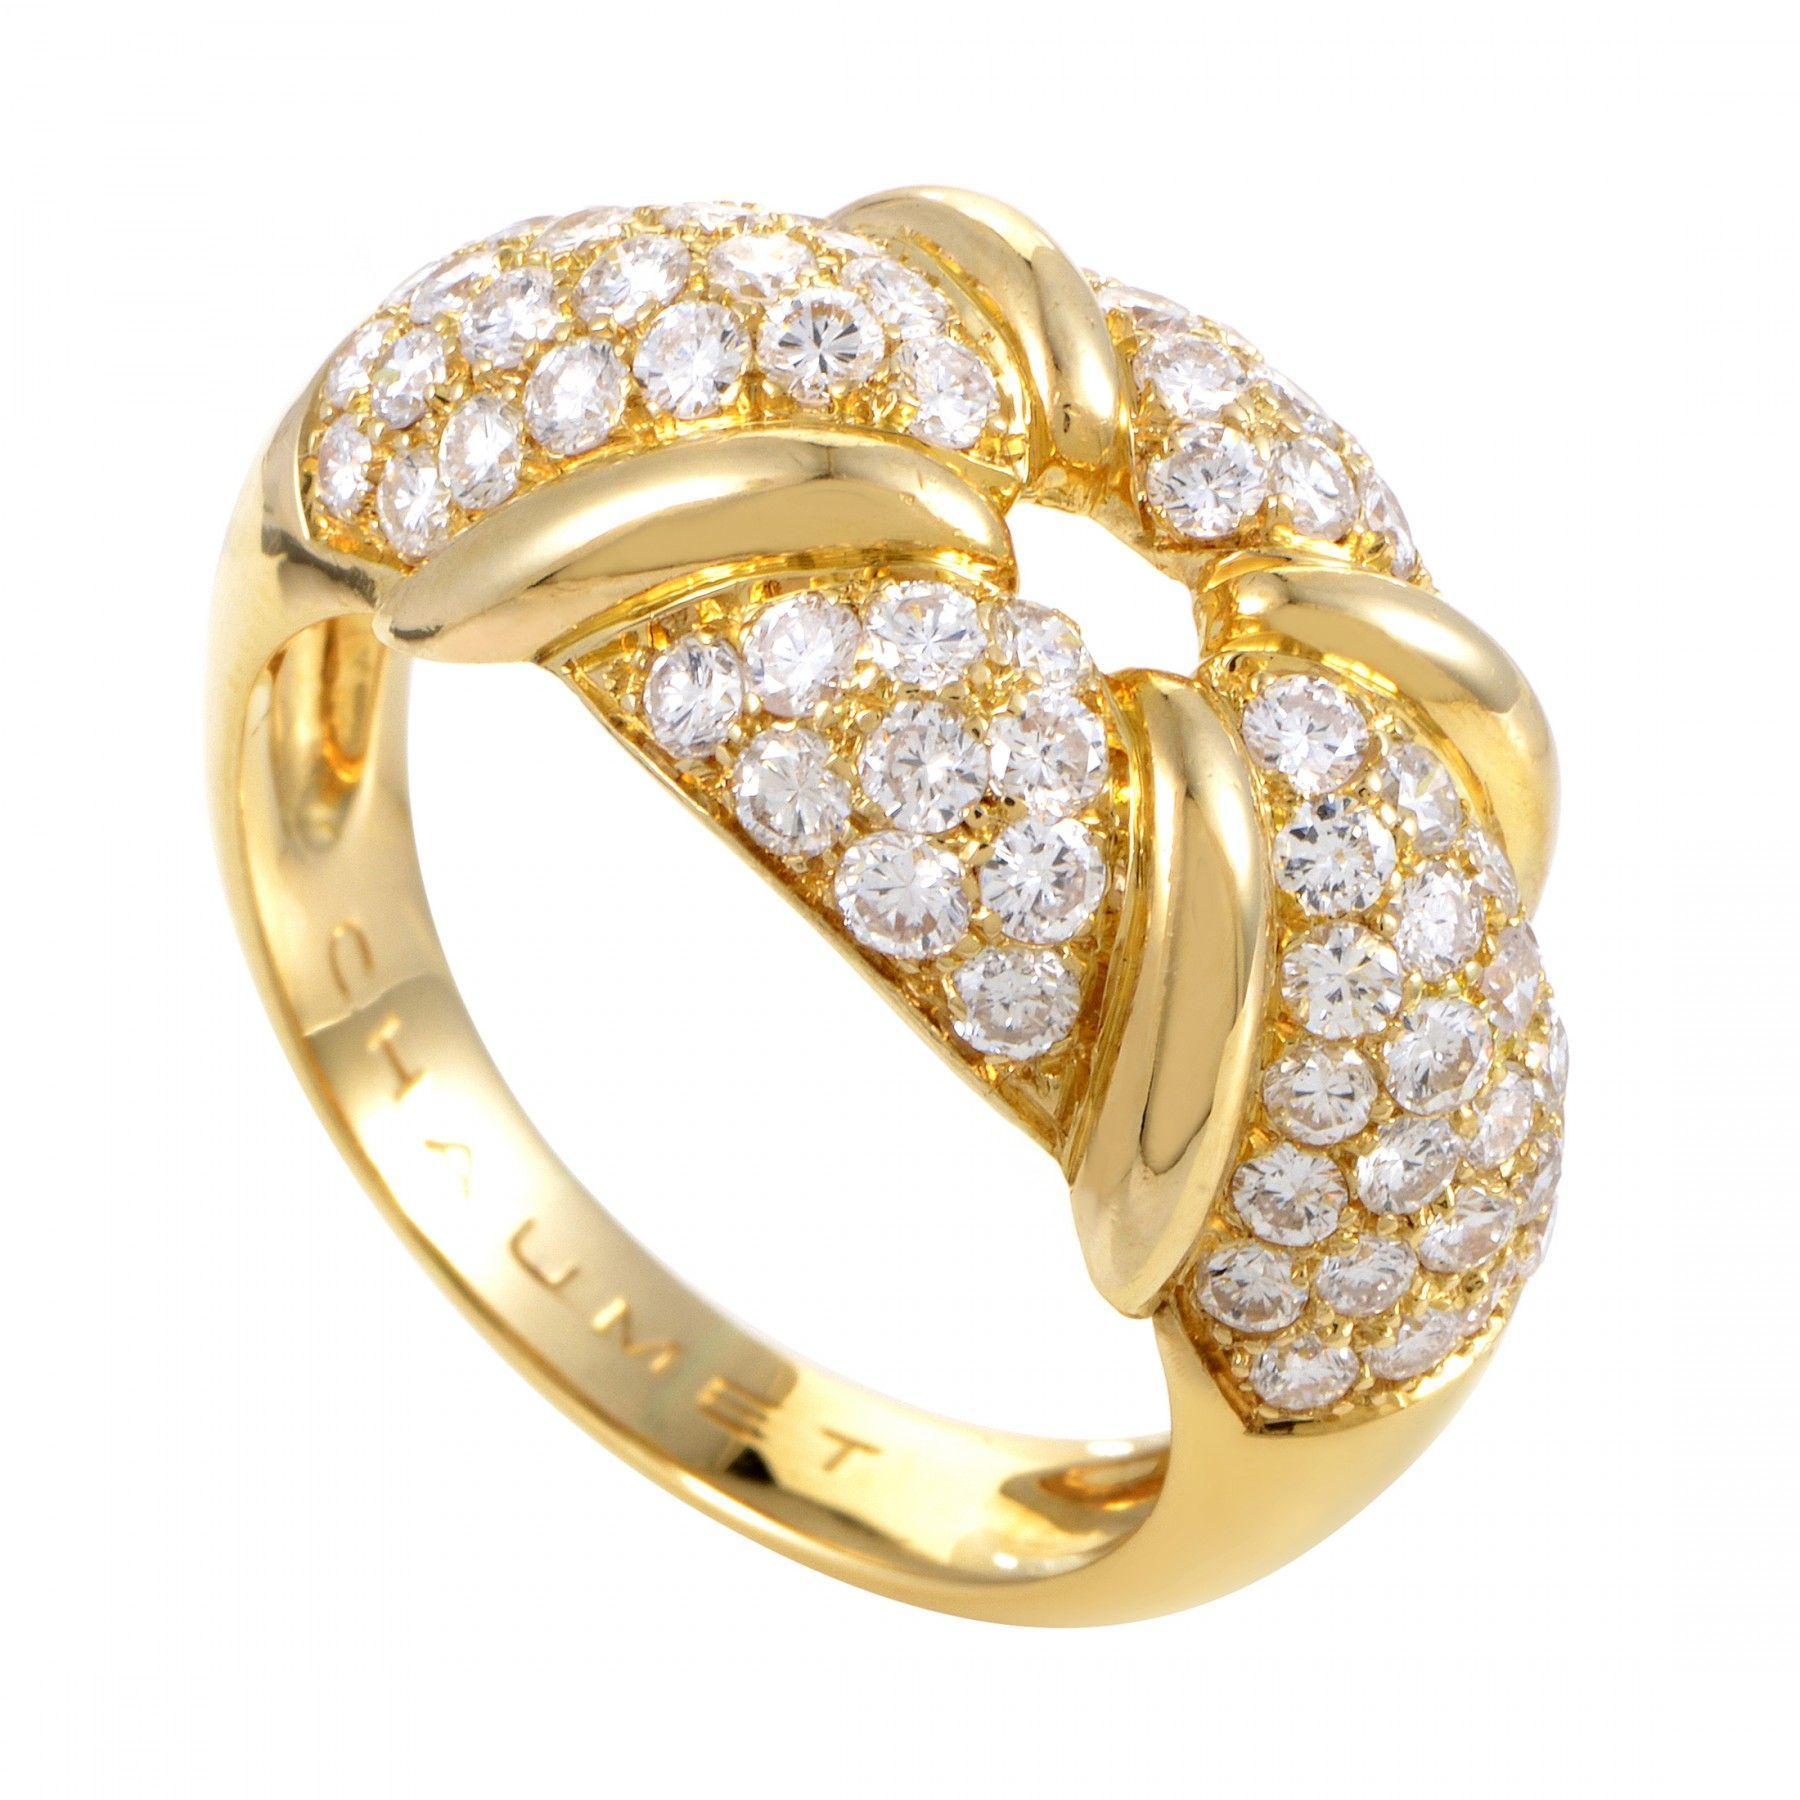 Chaumet Women's 18K Yellow Gold Diamond Pave Ring